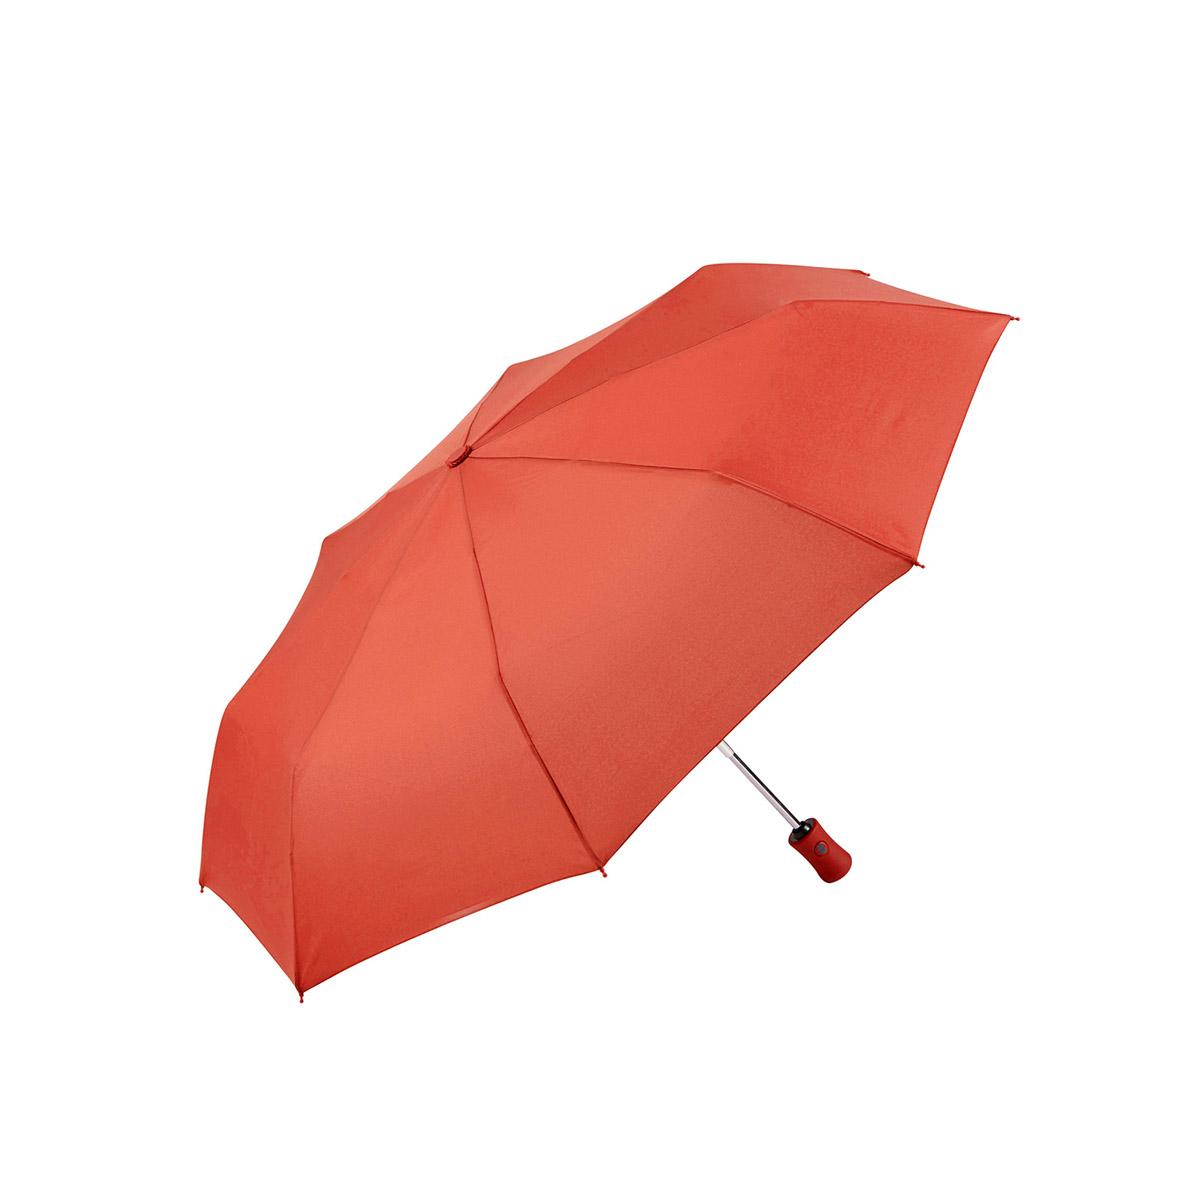 Paraguas plegable automático mujer Ezpeleta color liso